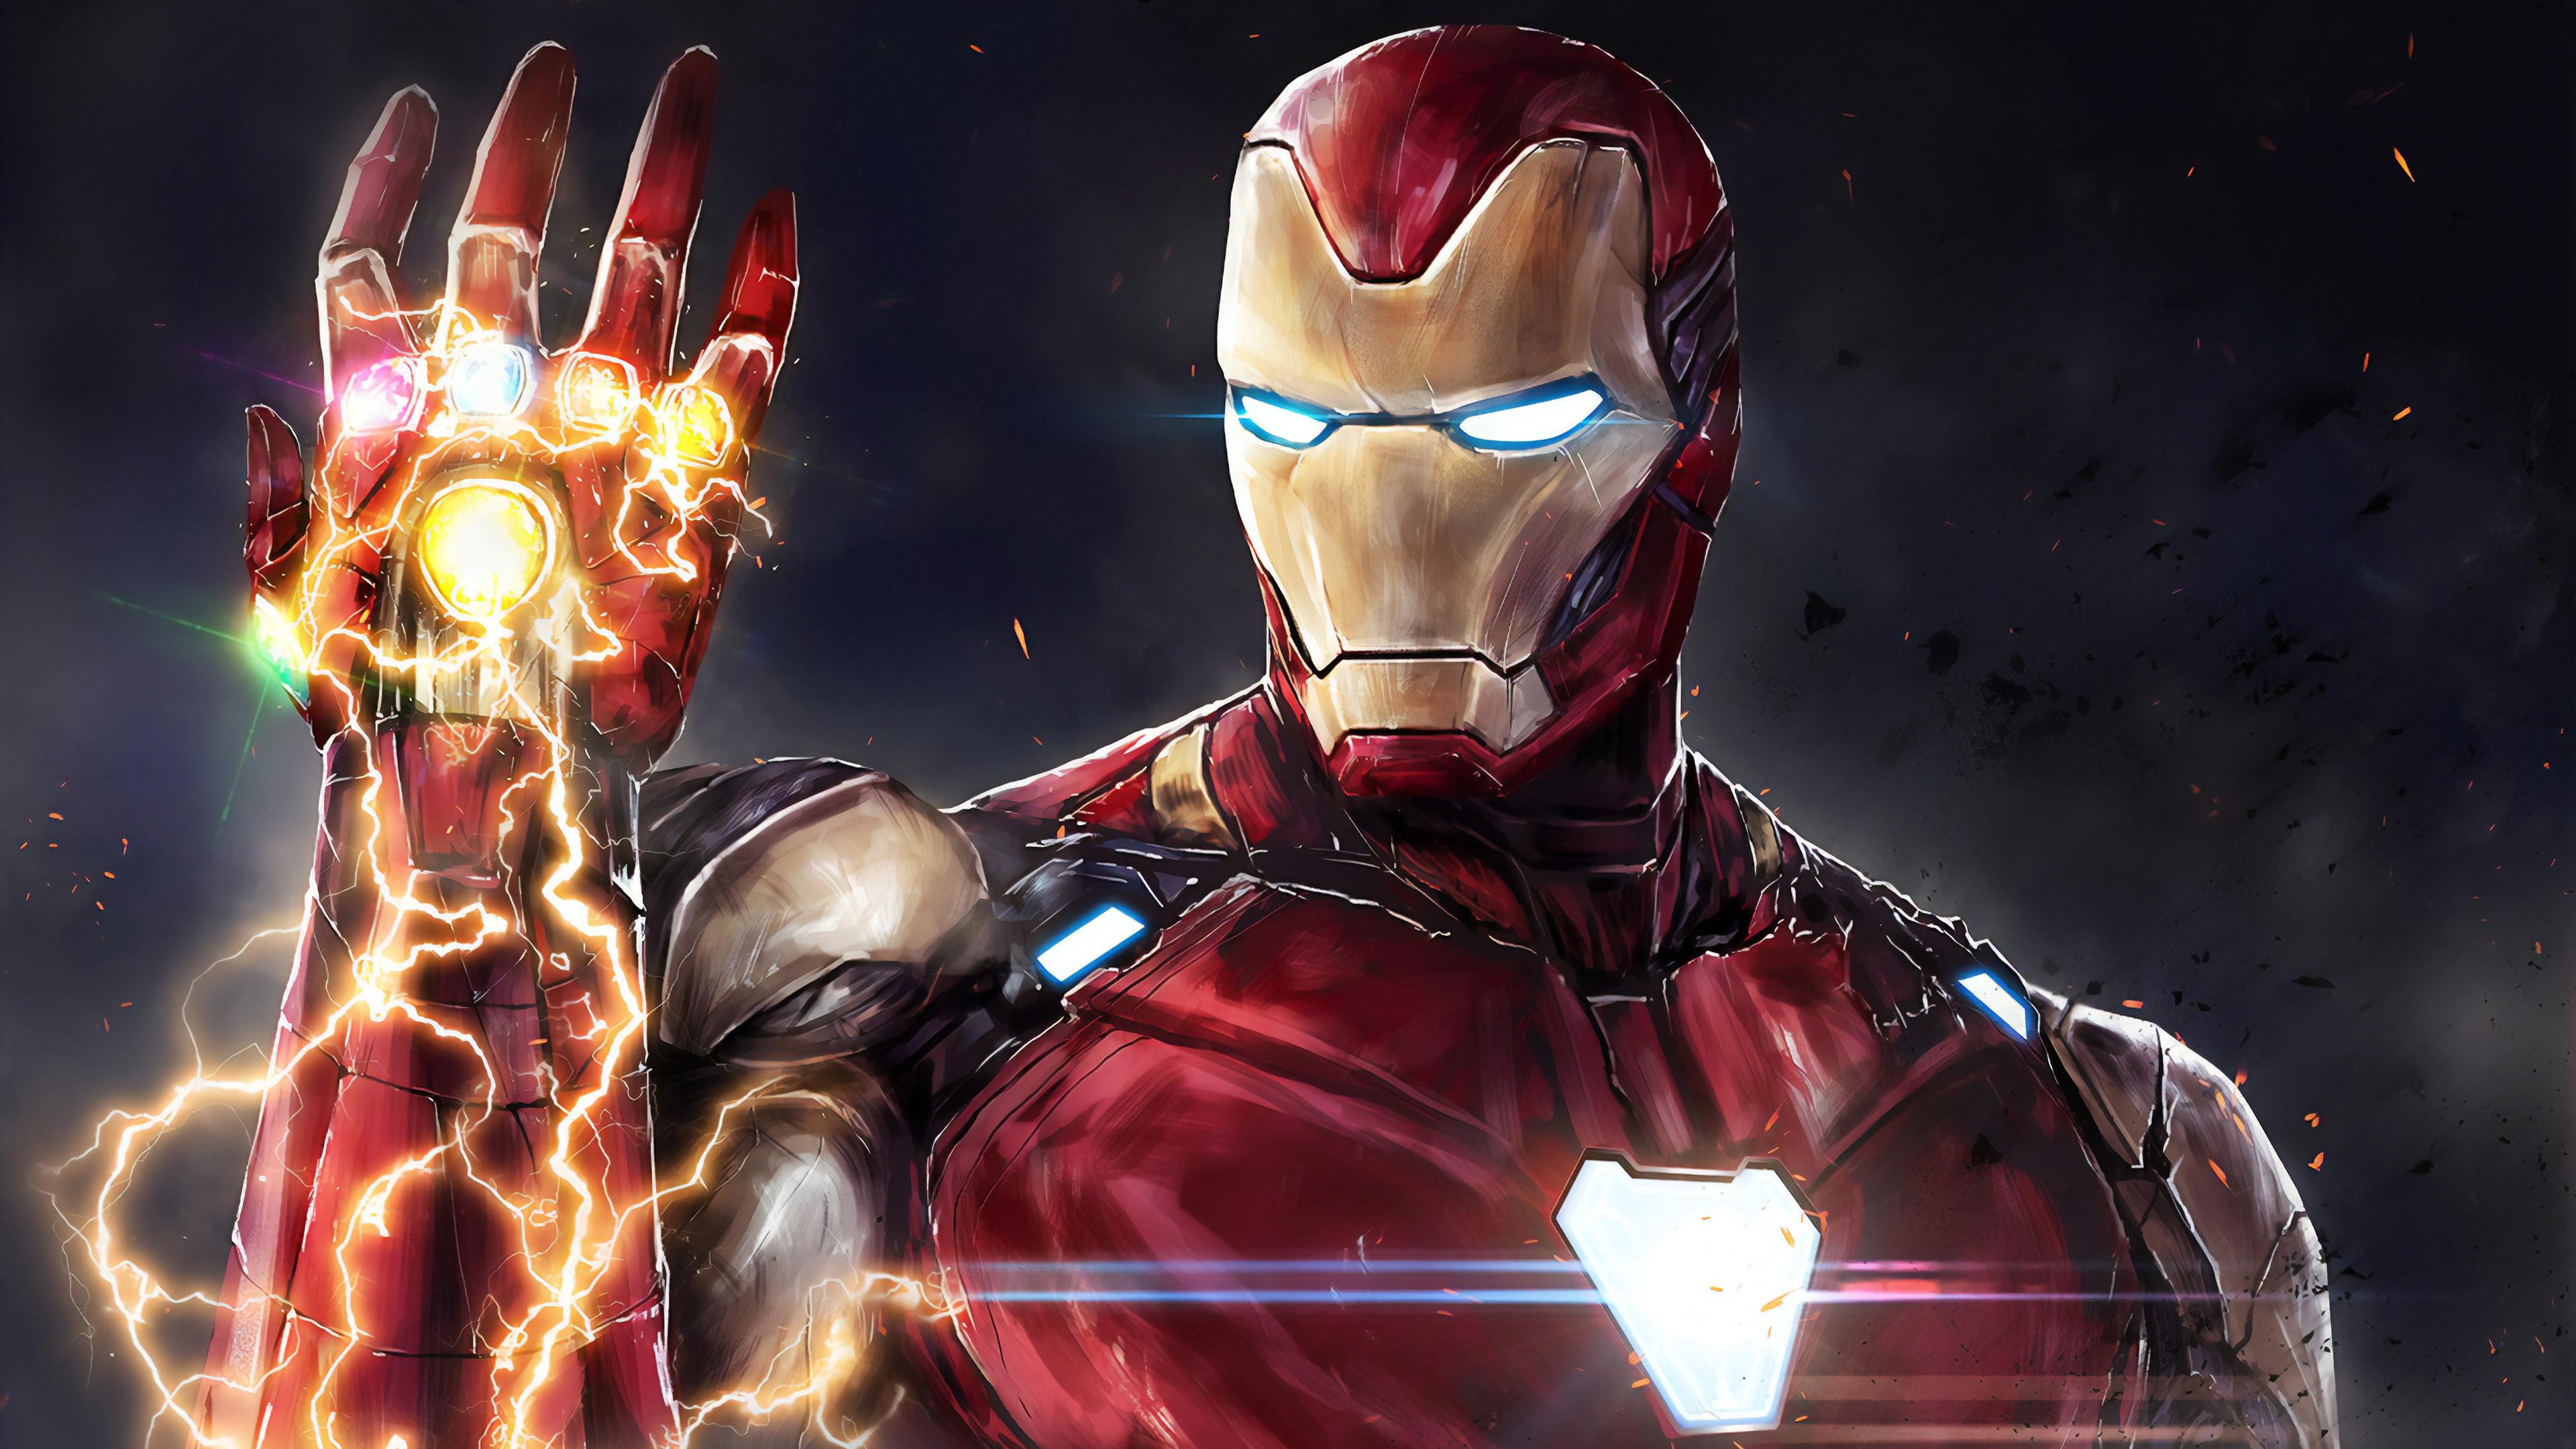 Download Wallpaper Iron Man 4k Hd Cikimm Com